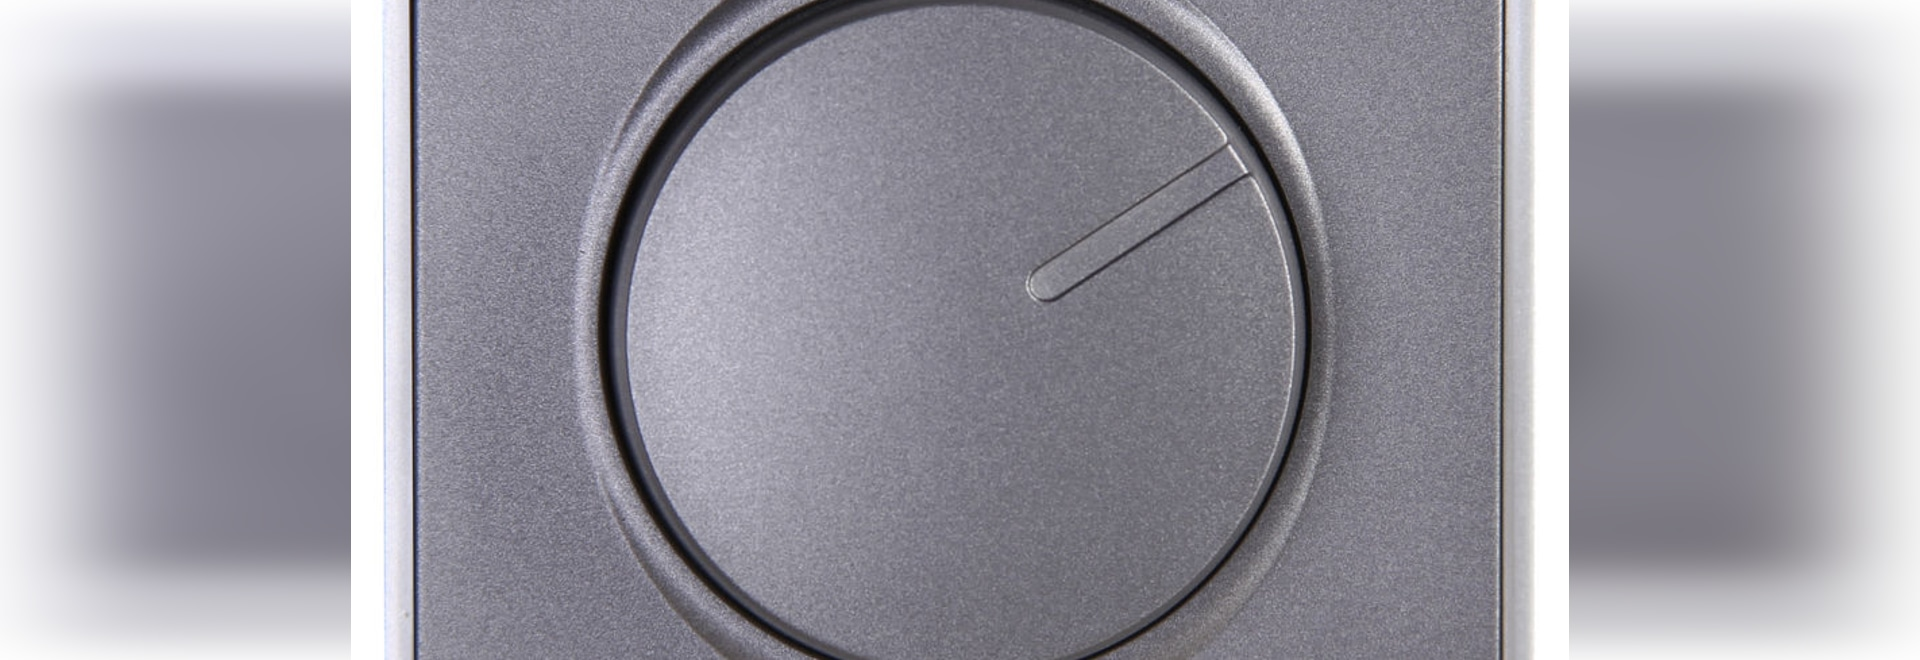 NEW: rotary light dimmer switch by Heinrich Kopp GmbH - Heinrich ...